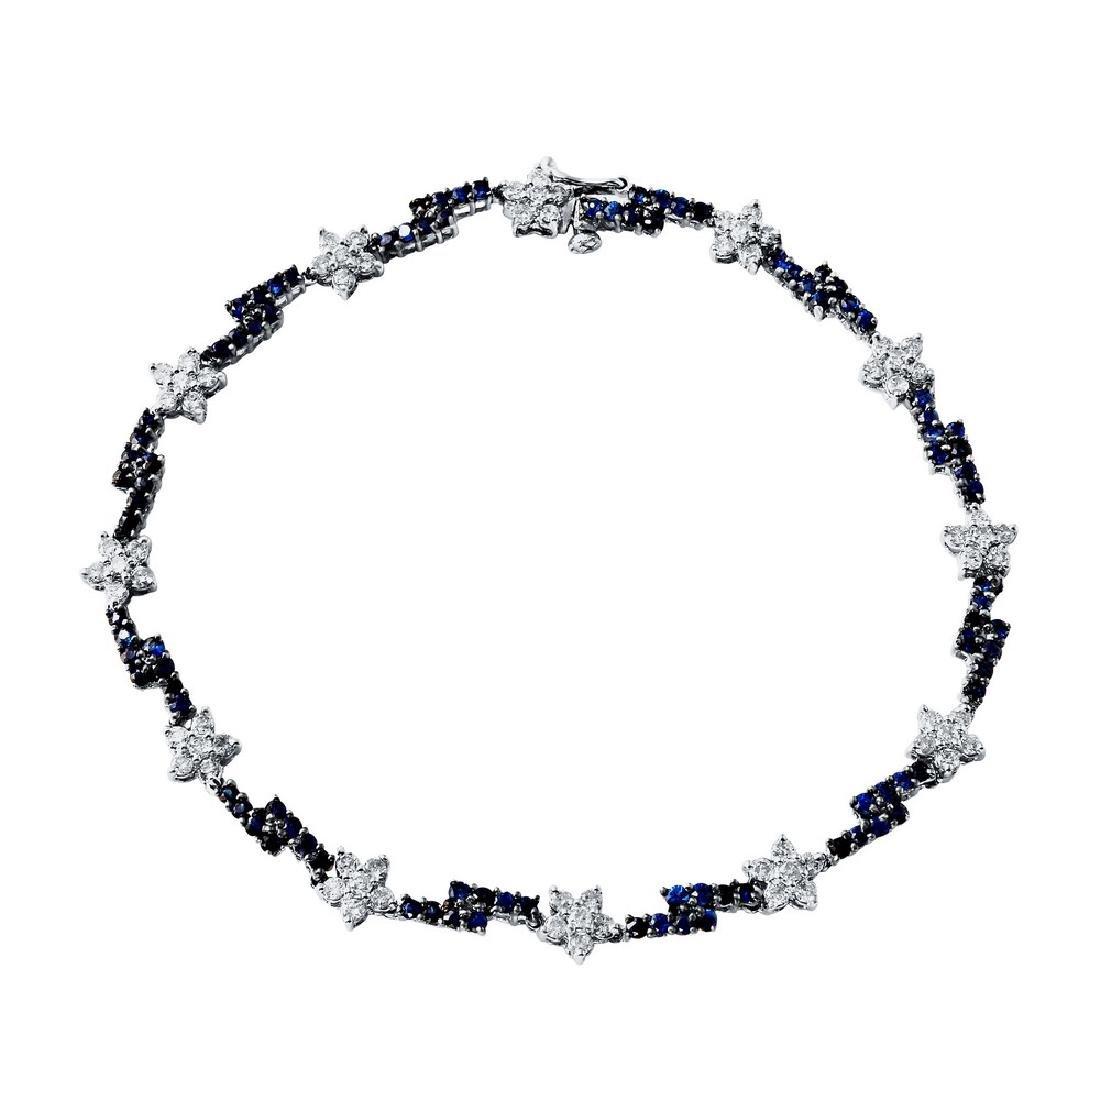 Genuine 2.83 TCW 14K White Gold Ladies Bracelet